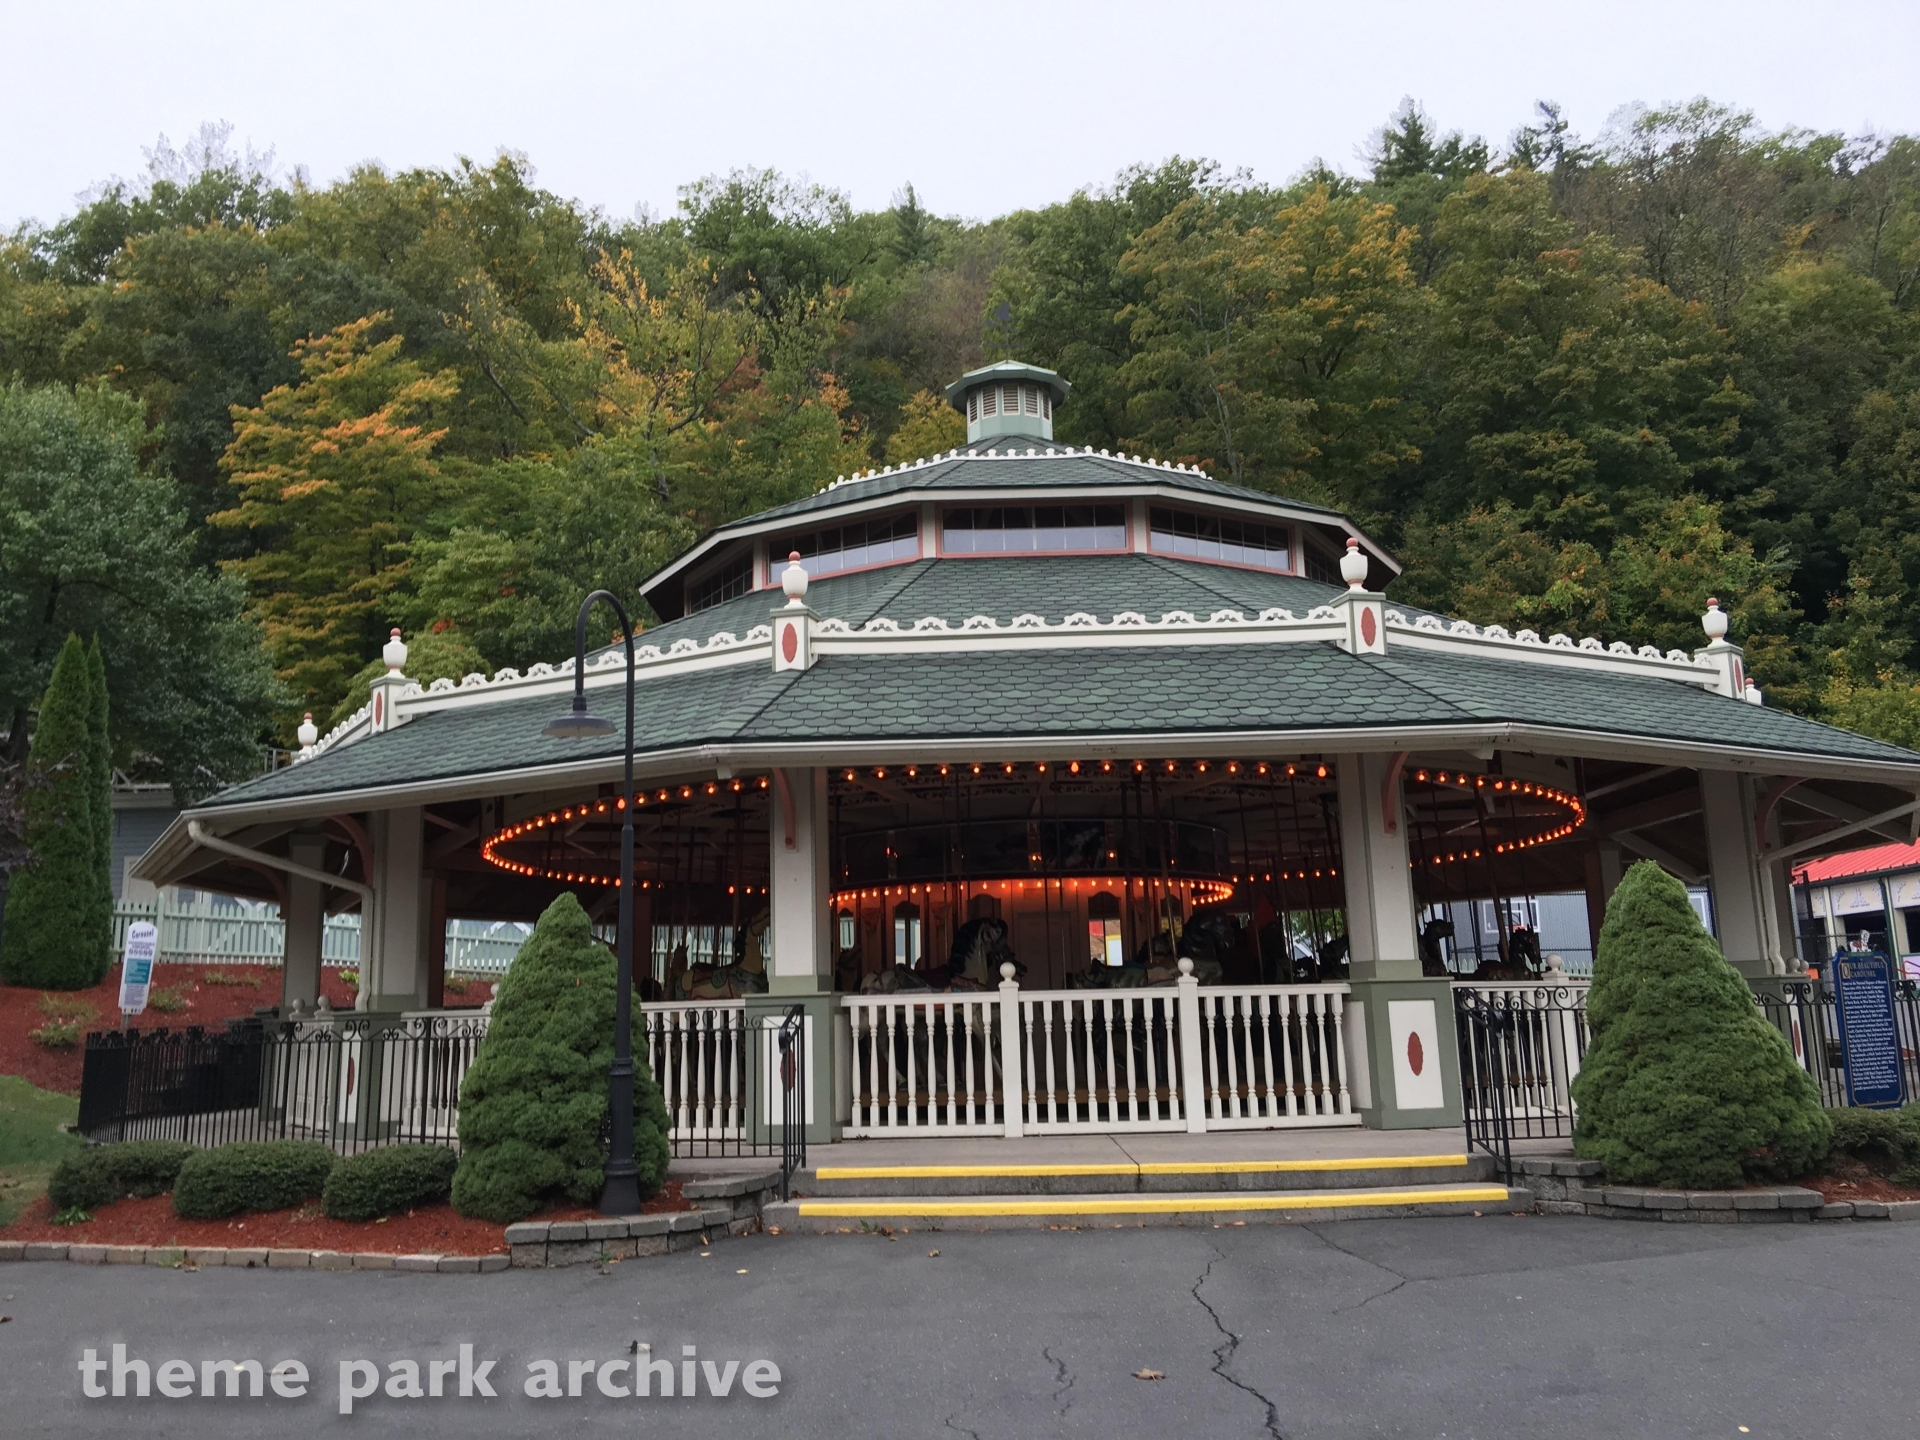 Carousel at Lake Compounce